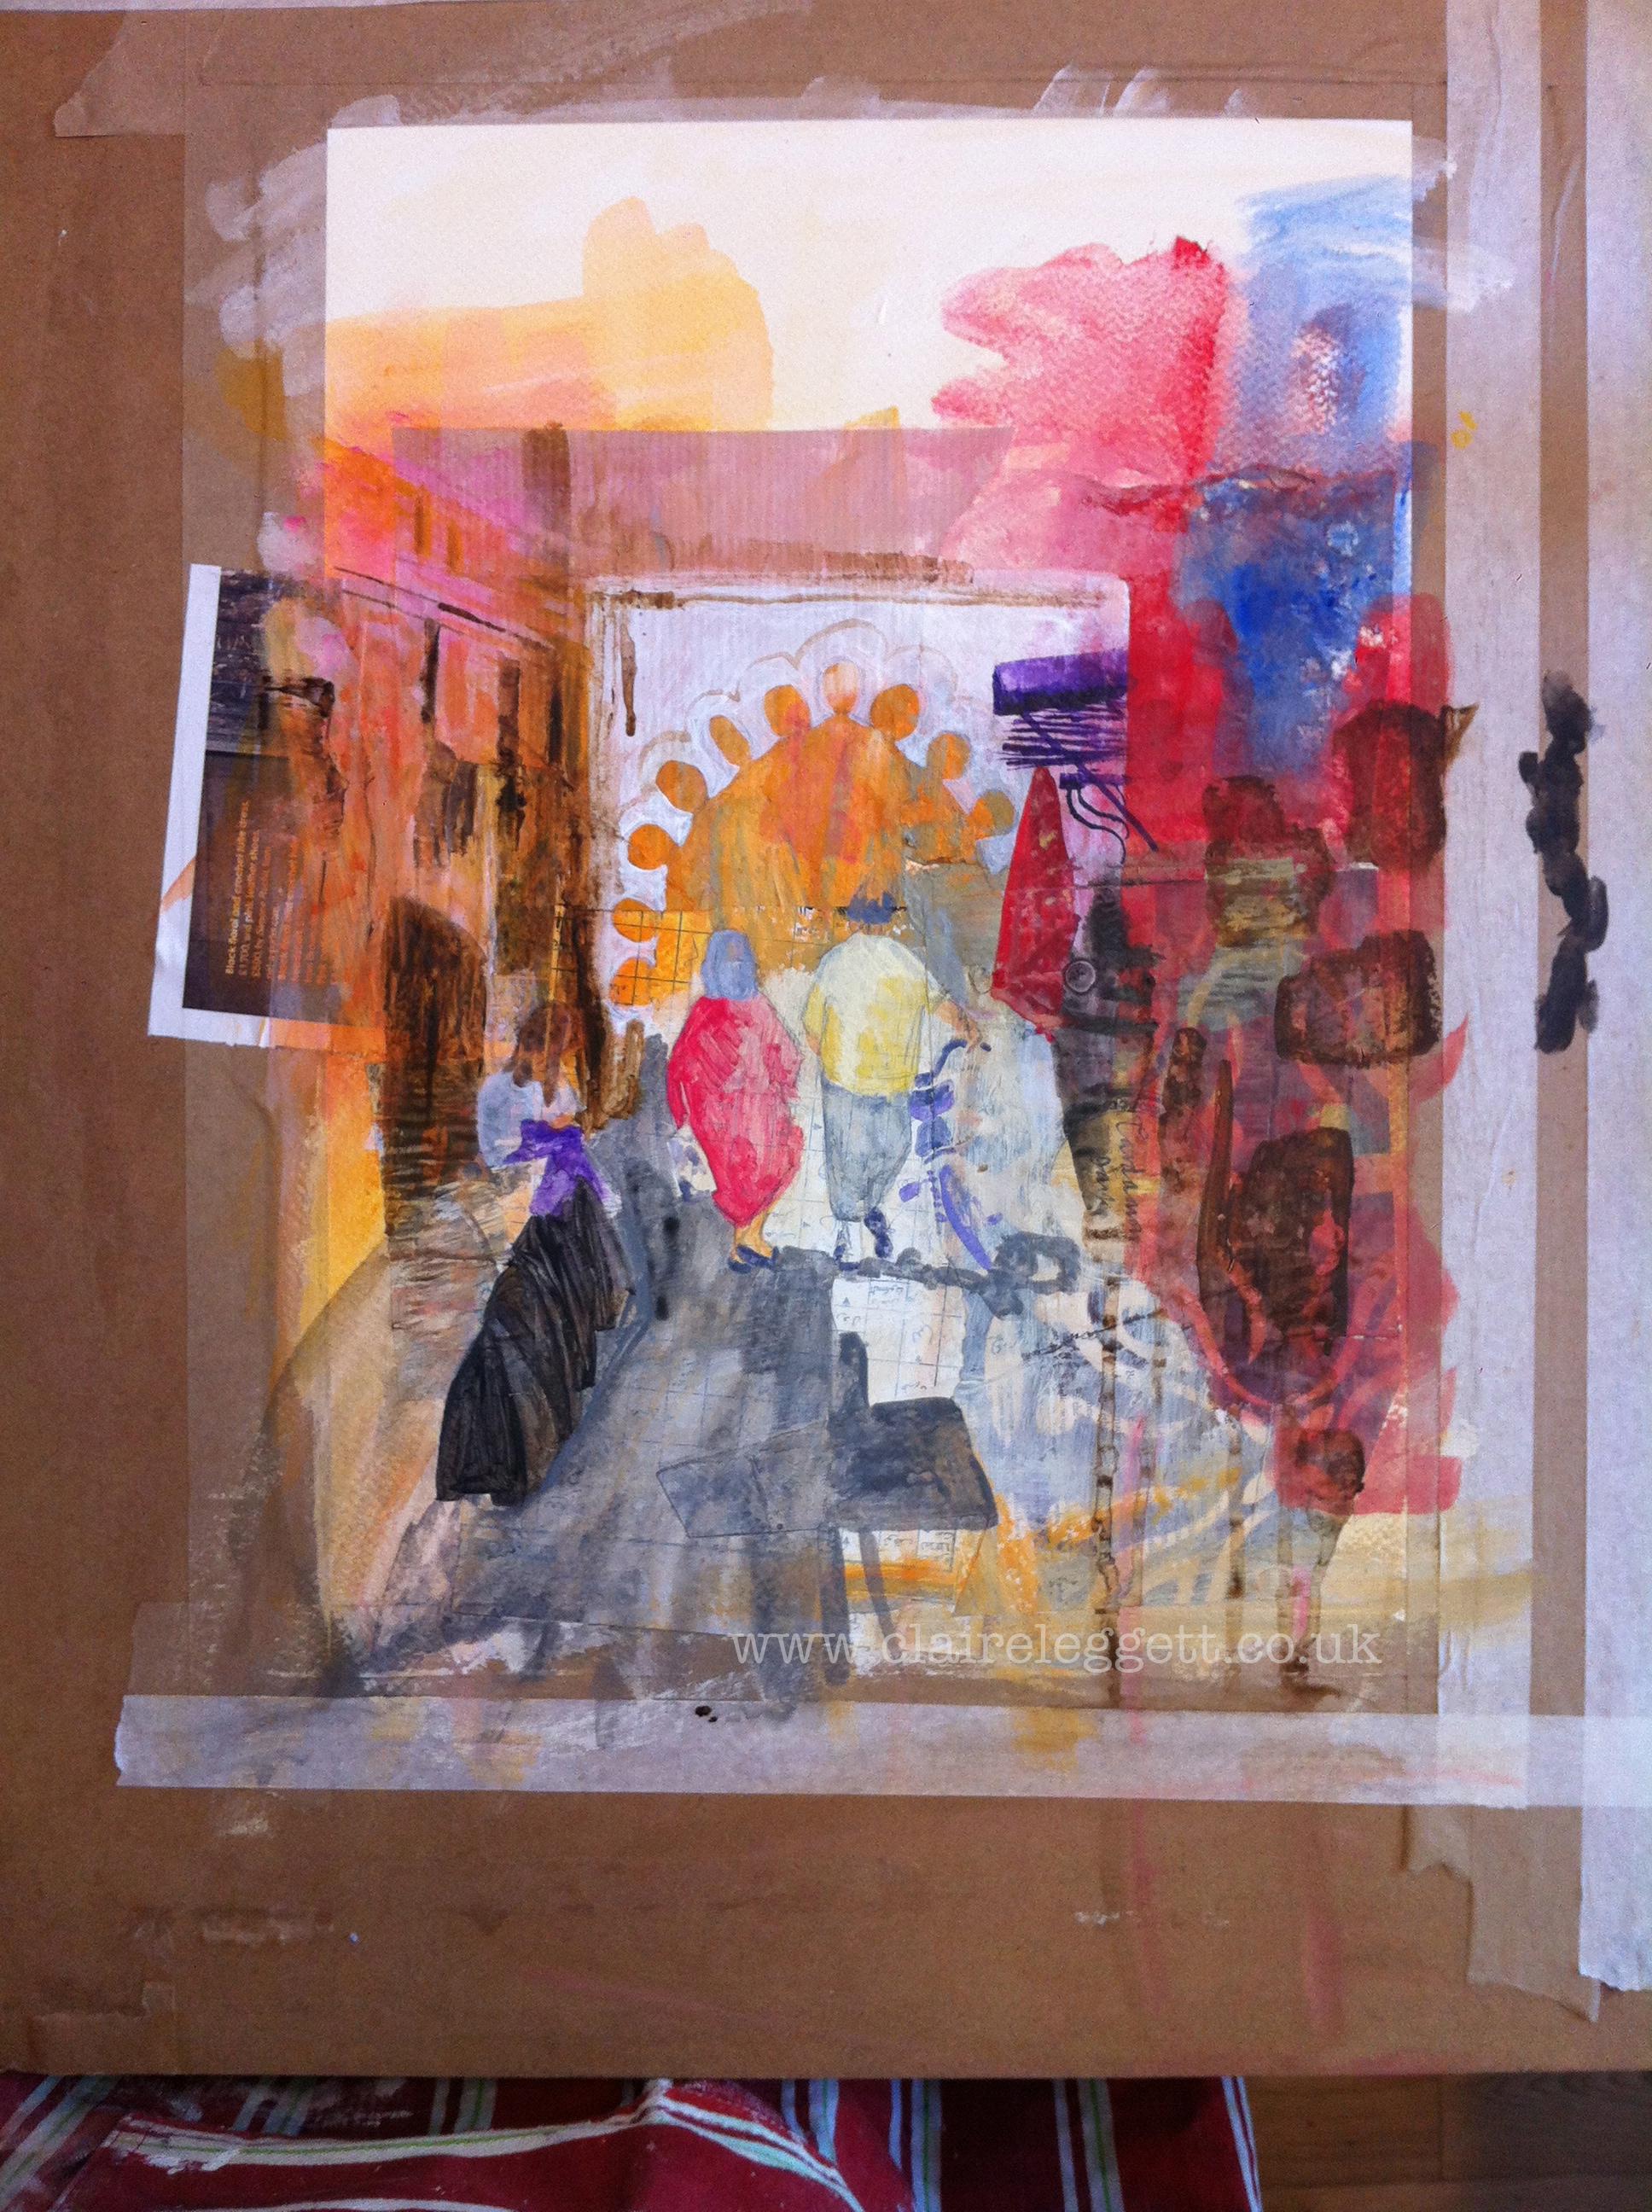 Claire_leggett_painter_in progress